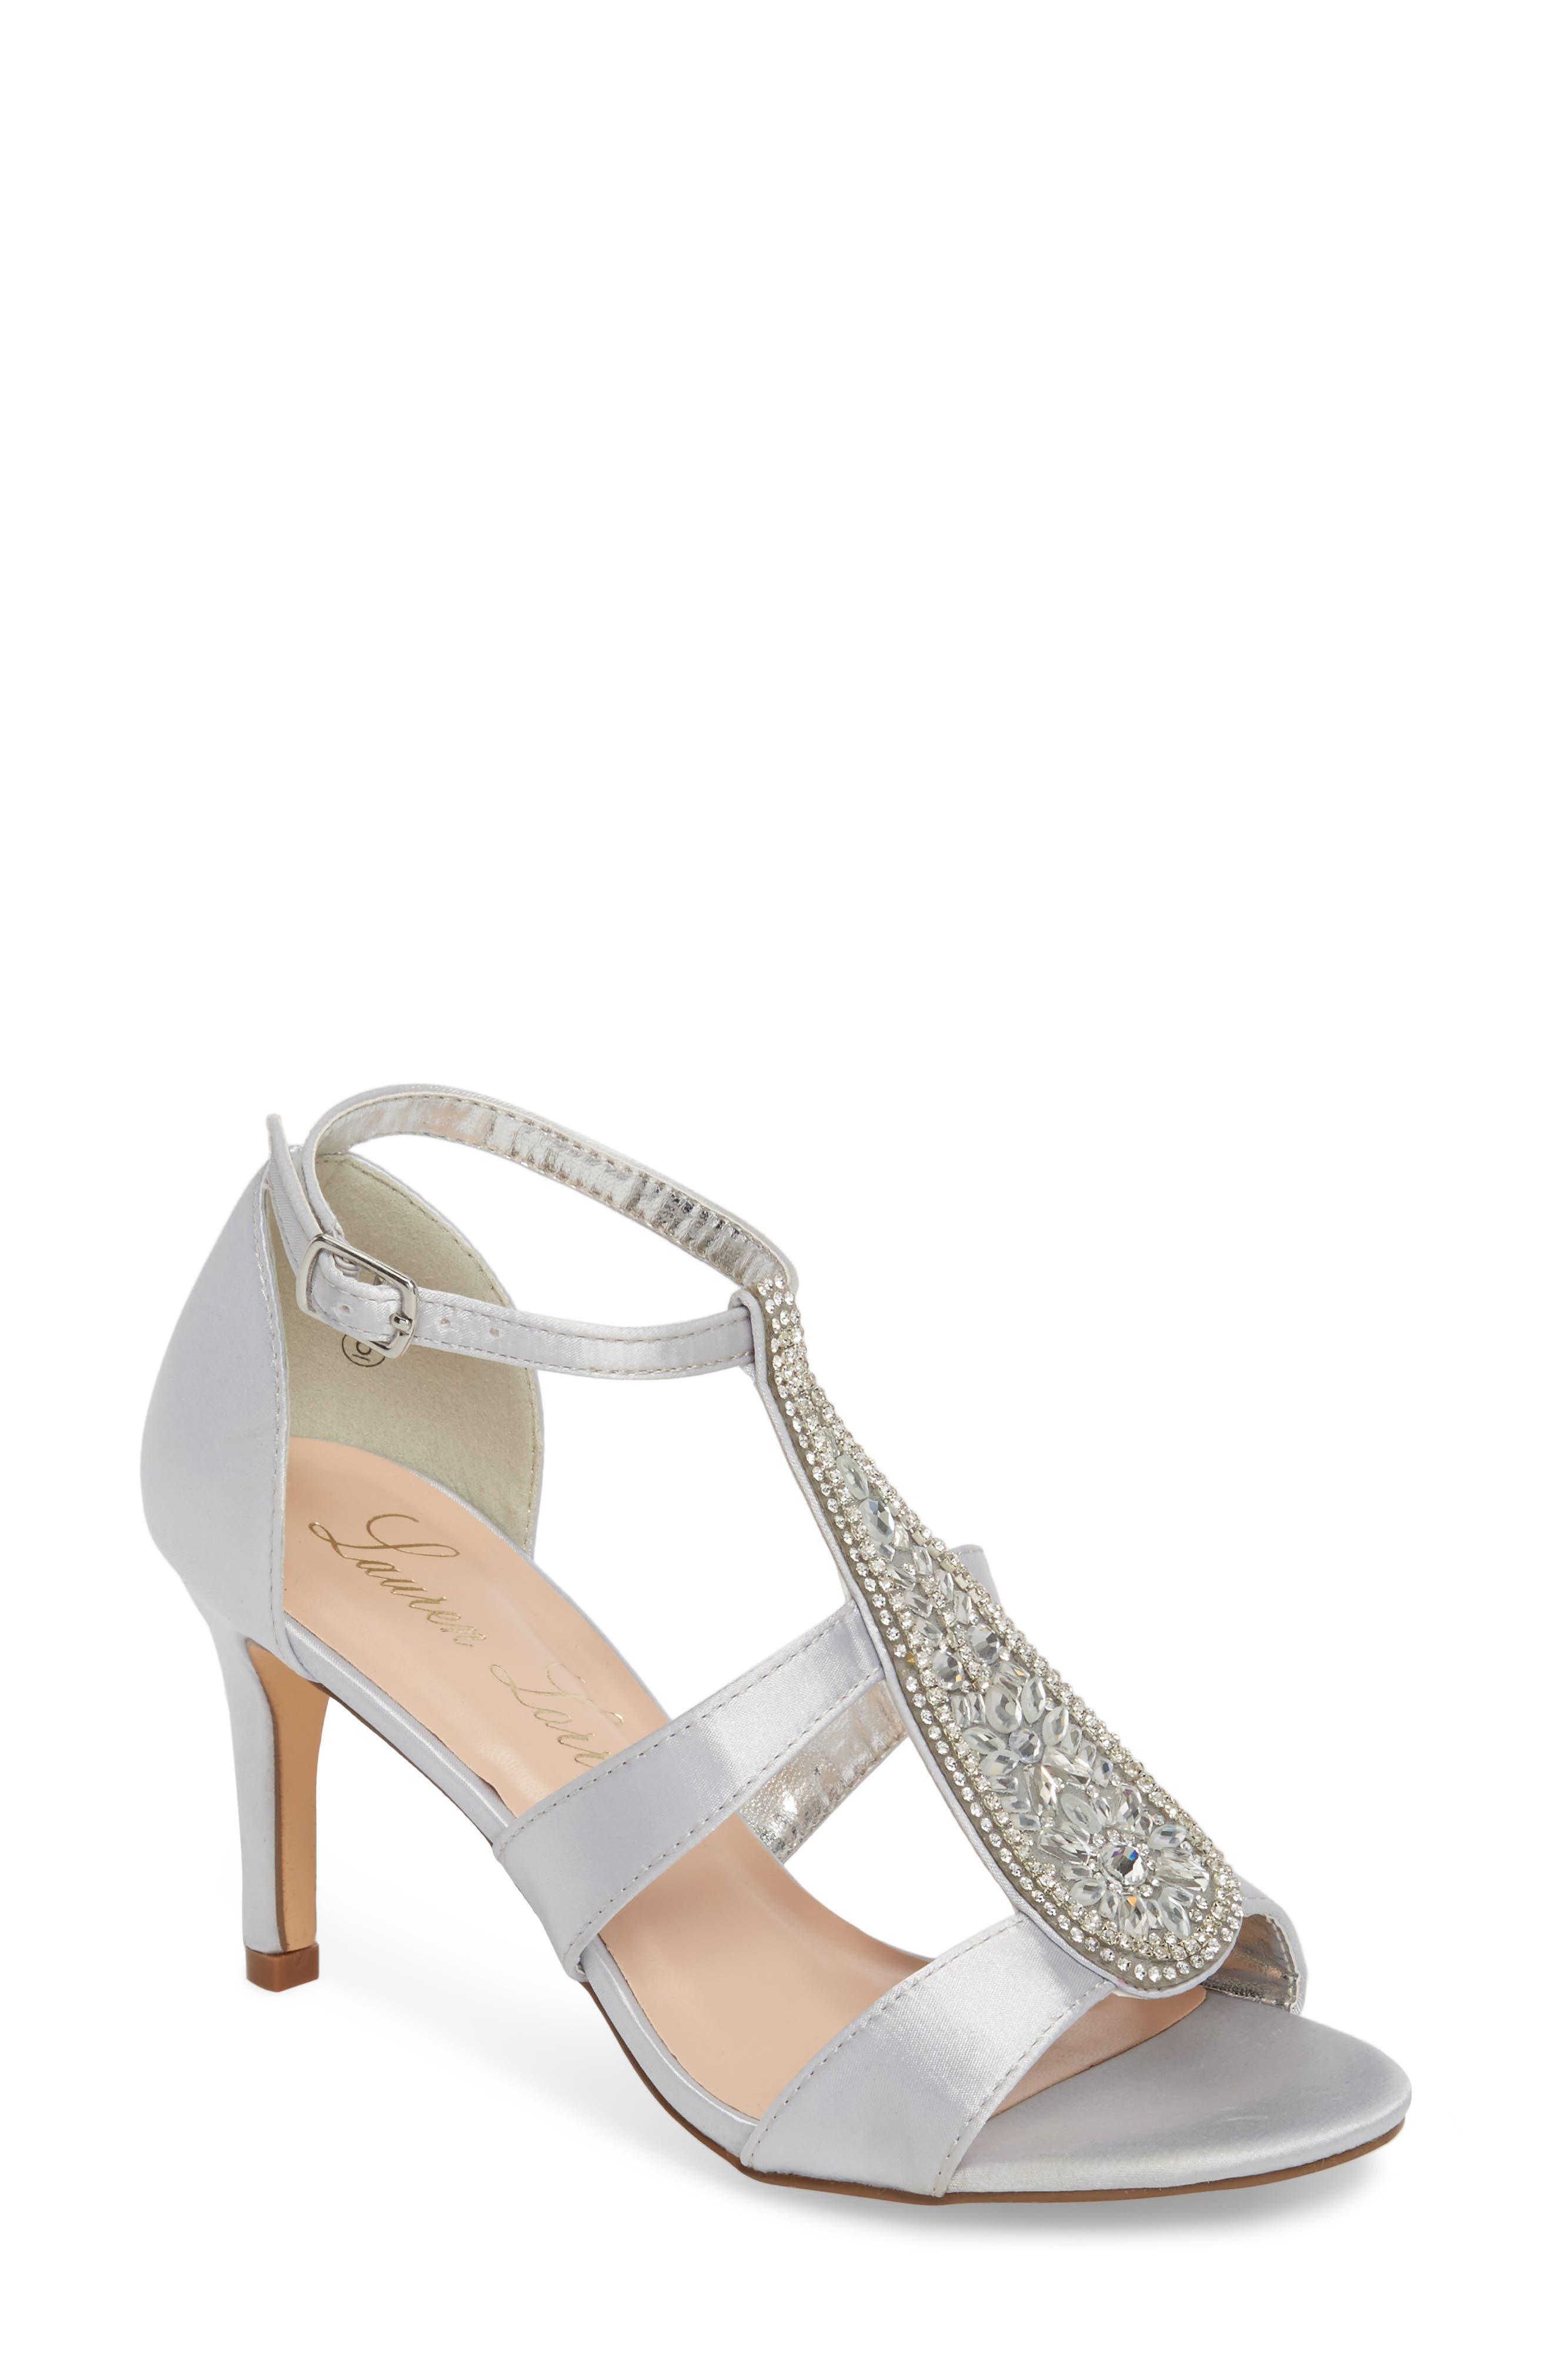 Lauren Lorraine Bernie Embellished Metallic Sandal zSV4zoPD